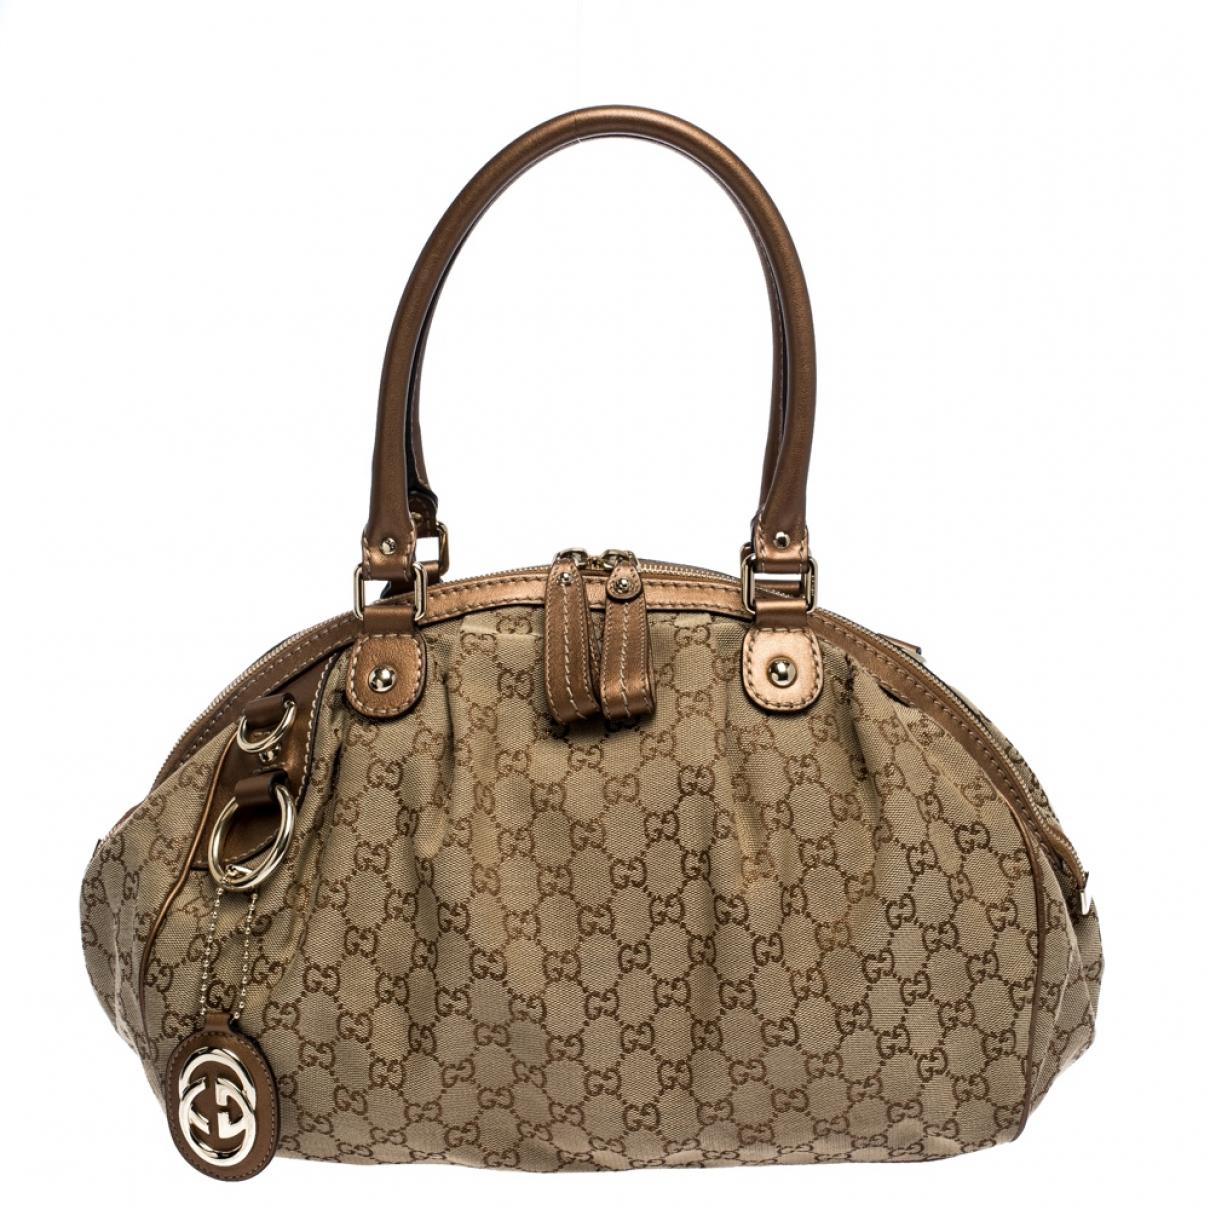 Gucci Sukey Metallic Leather handbag for Women \N